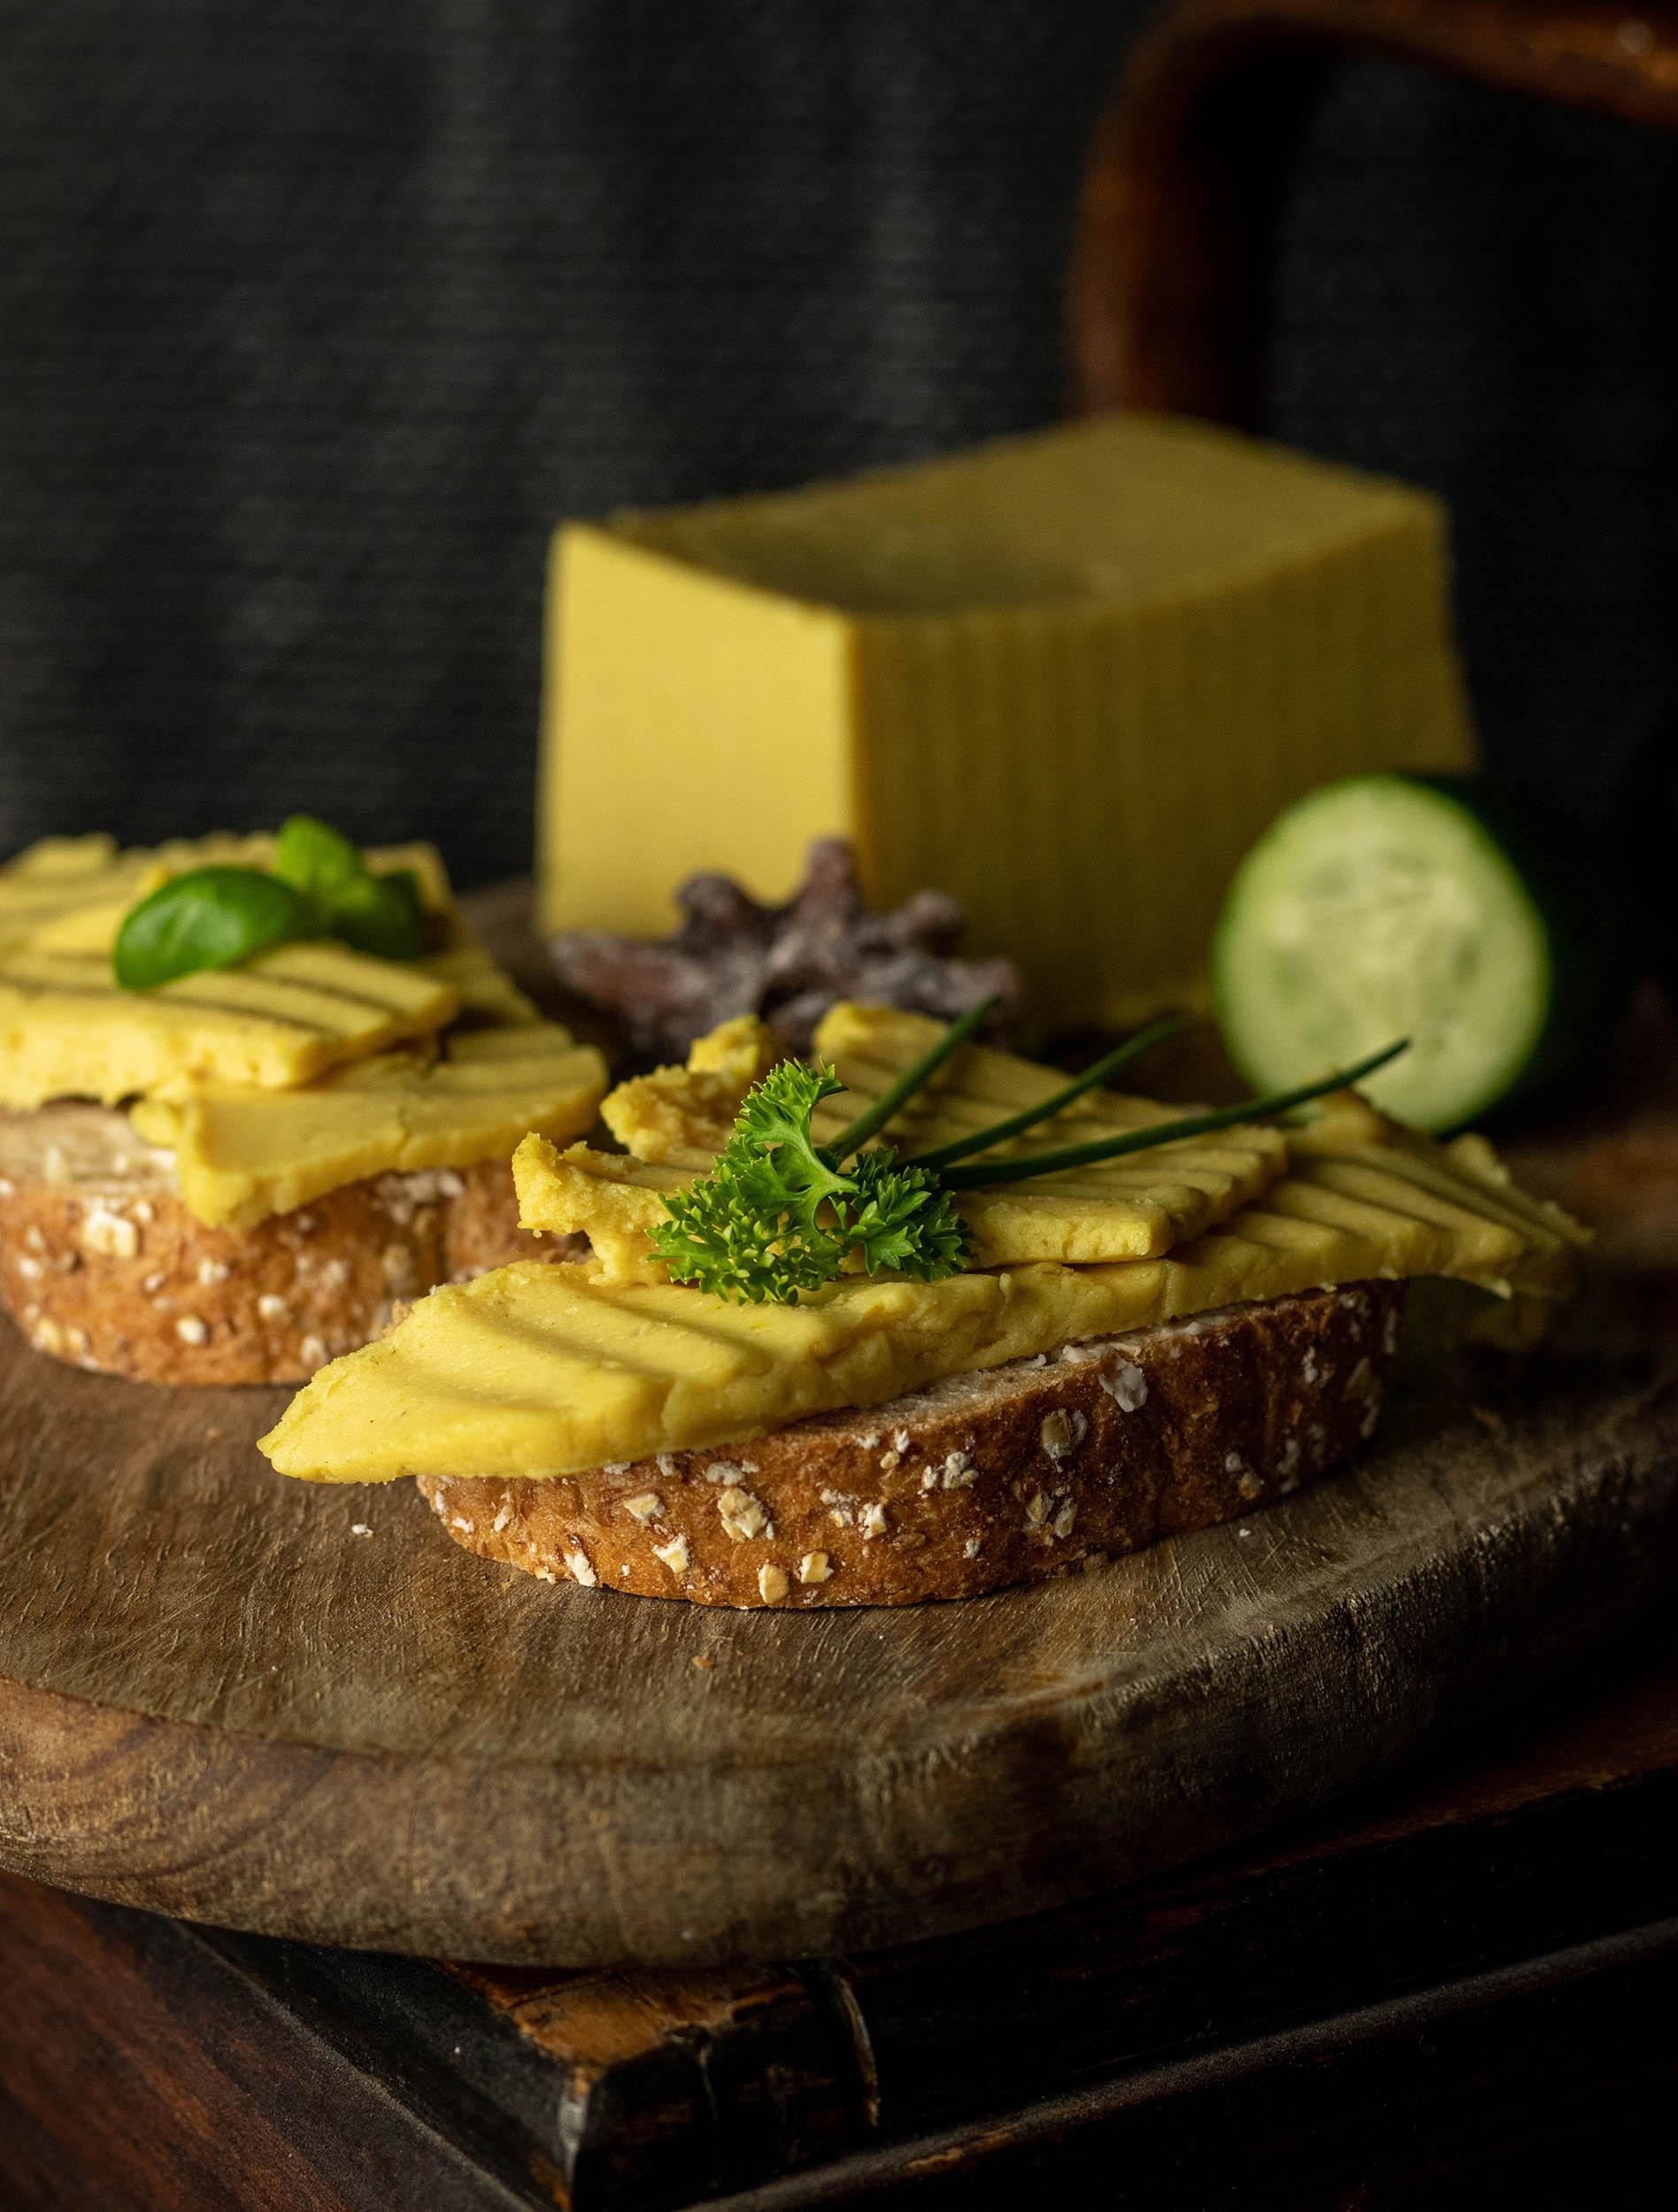 A wonderful, piquant, vegan cheese